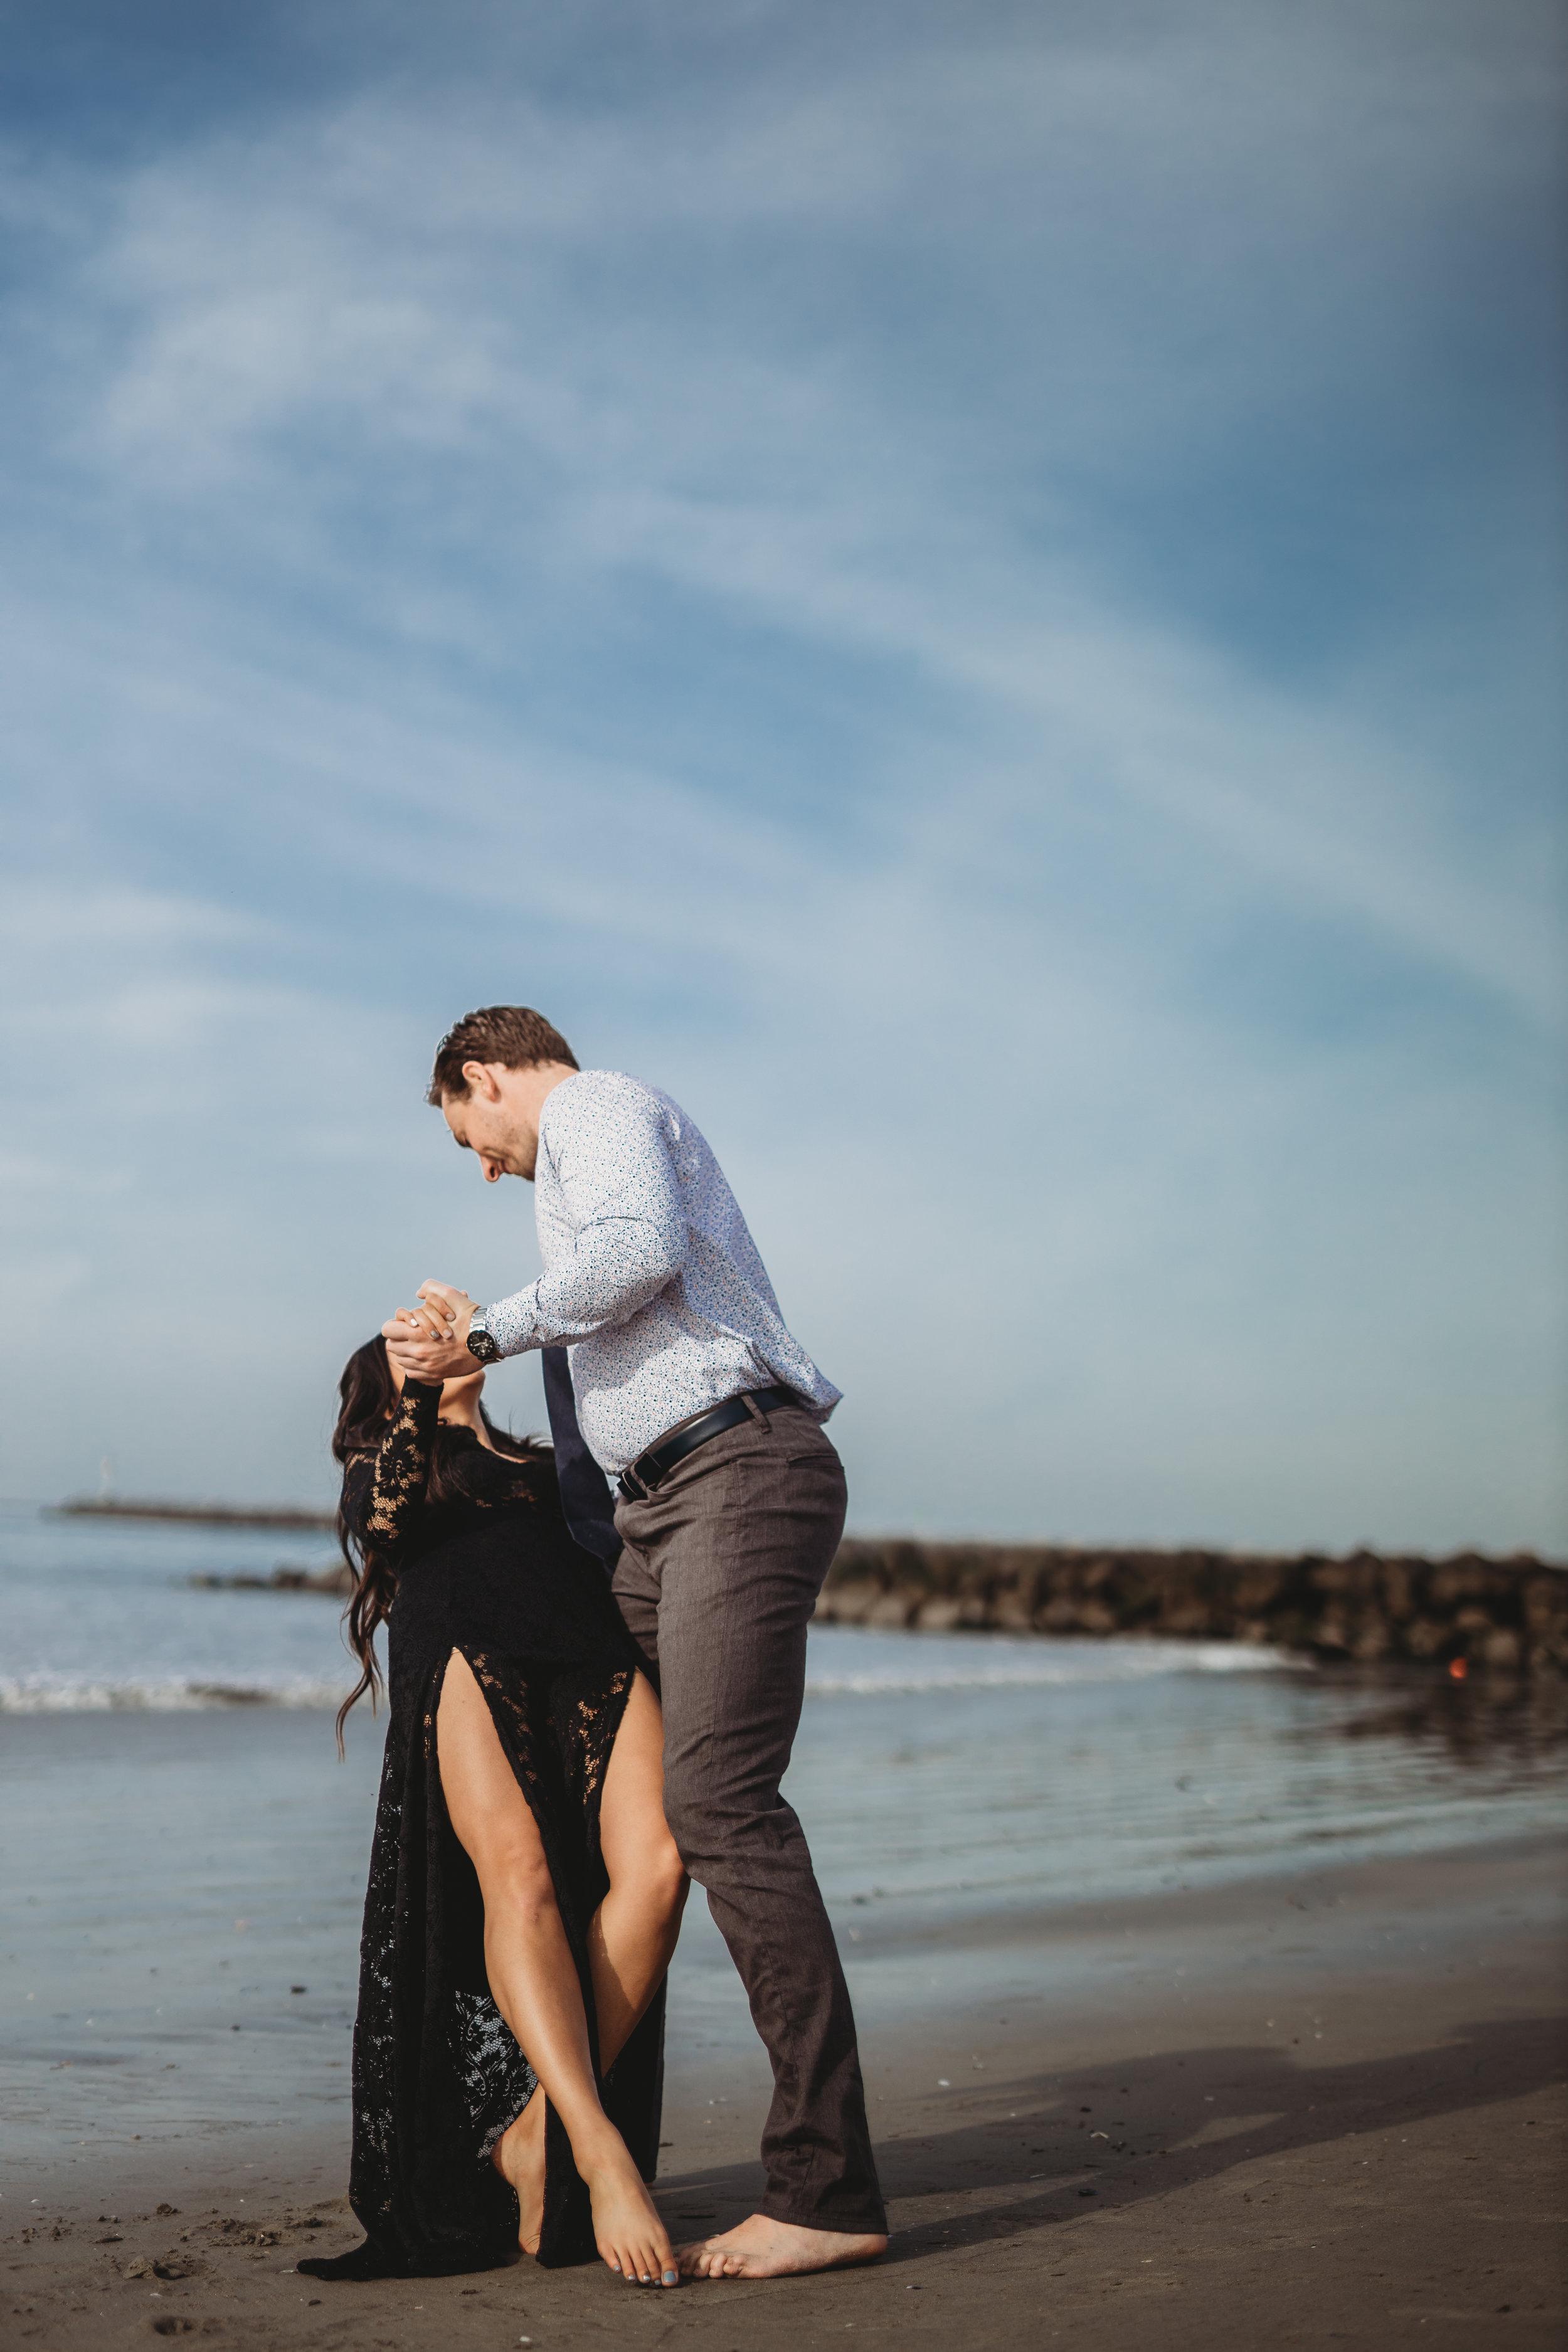 beach-couples-engagement-photoshoot-7505.jpg